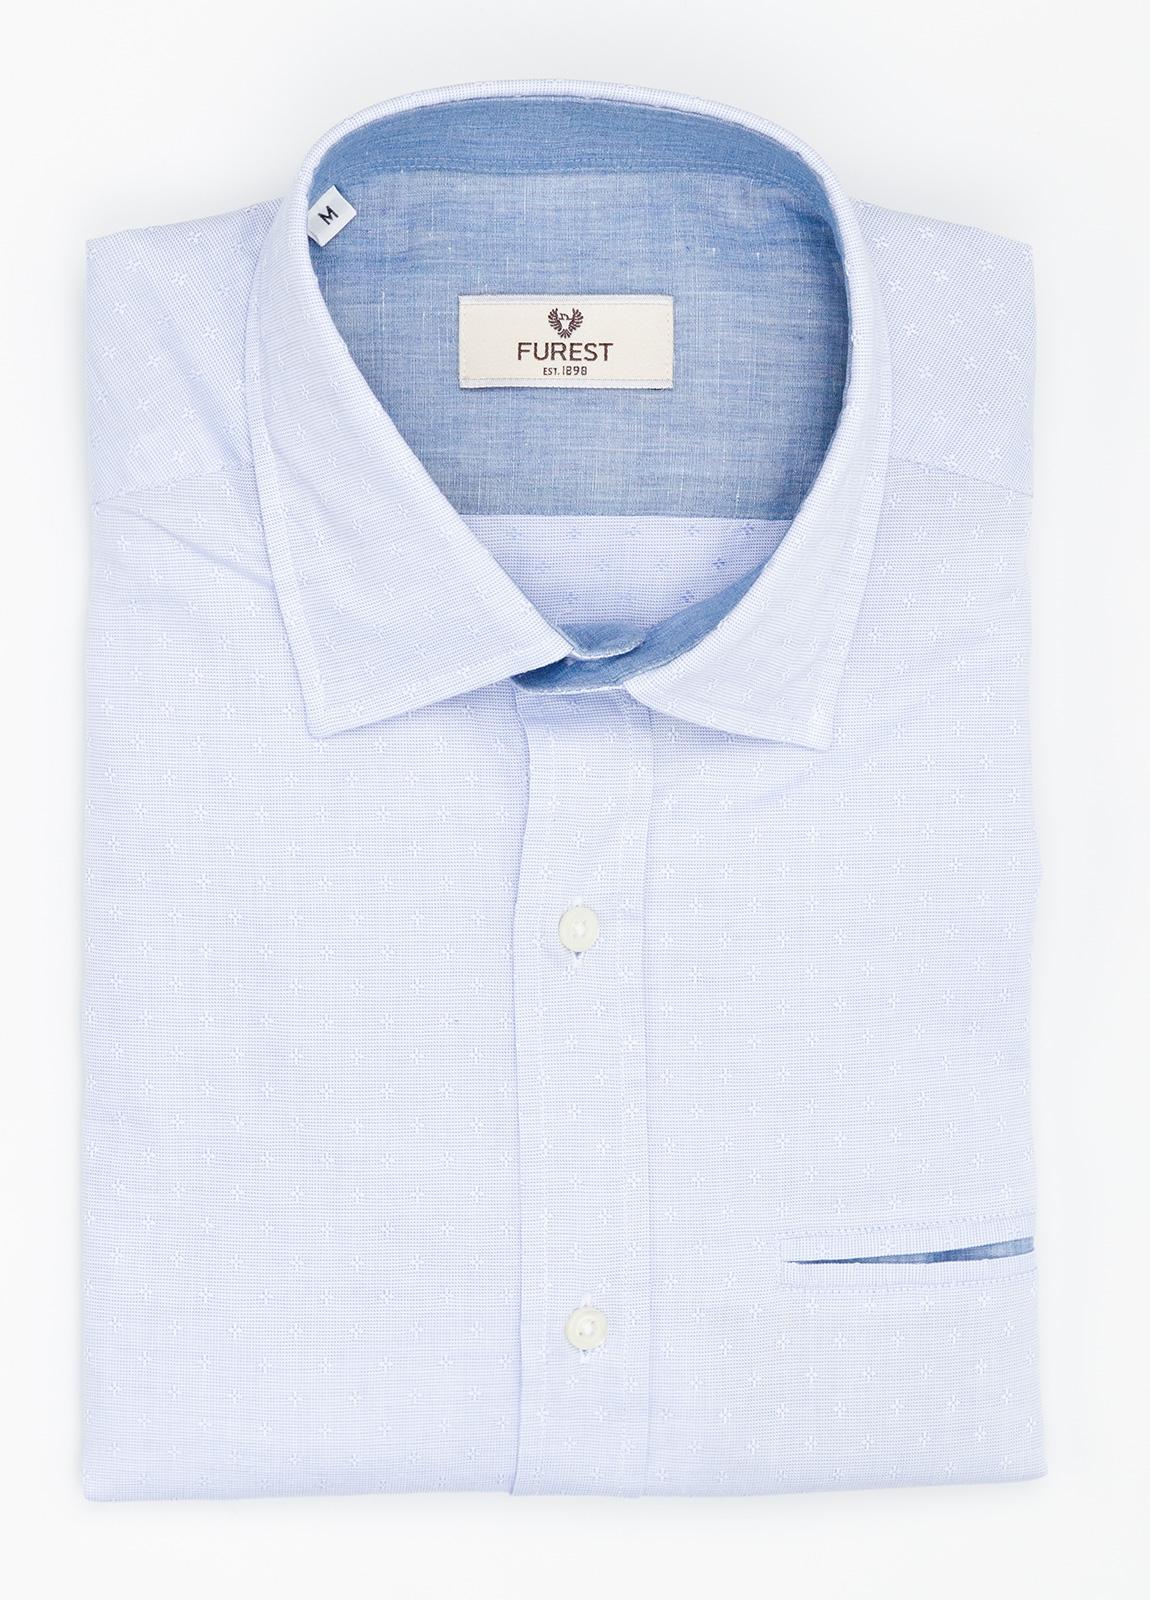 Camisa Leisure Wear SLIM FIT modelo PORTO micro estampado color celeste. 100% Algodón.